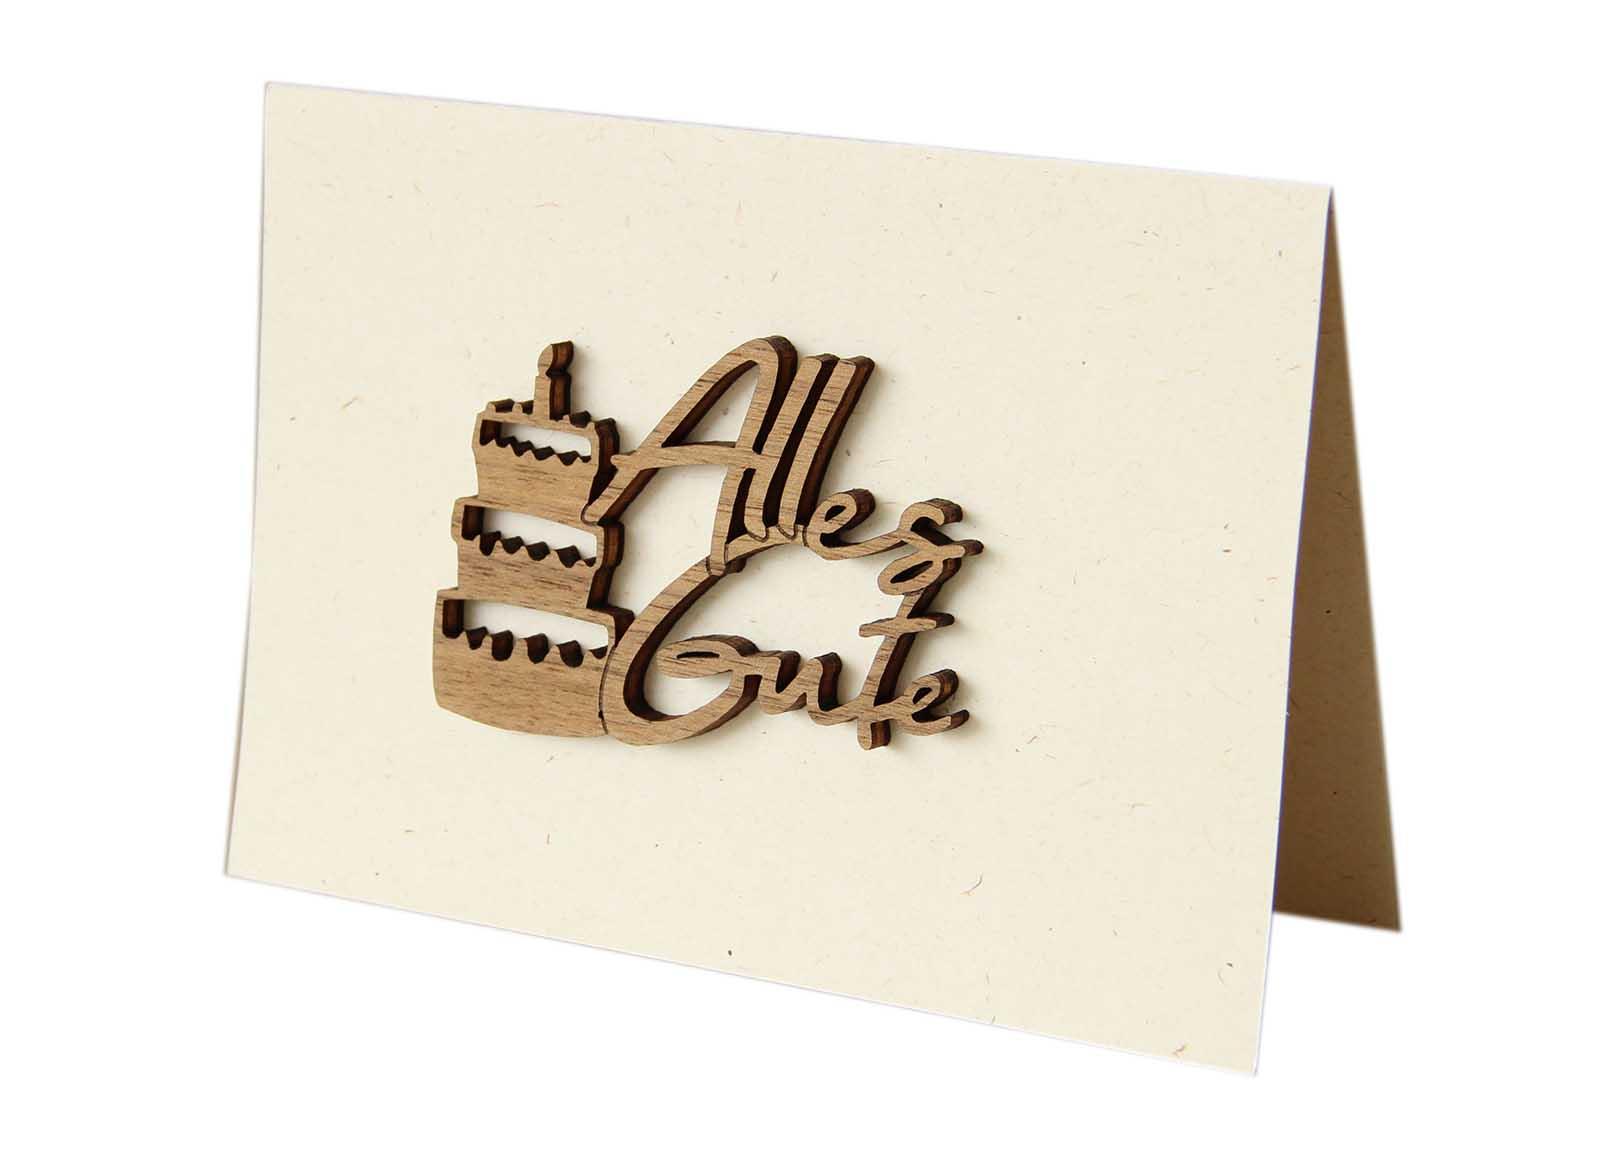 "Holzgrußkarte - Papierkarte mit Schriftzug aus Echtholz in Nuss ""Alles Gute"", inkl. Motiv Torte, Postkarte, Geschenkkarte, Klappkarte, Karte, Geburtstagskarte"